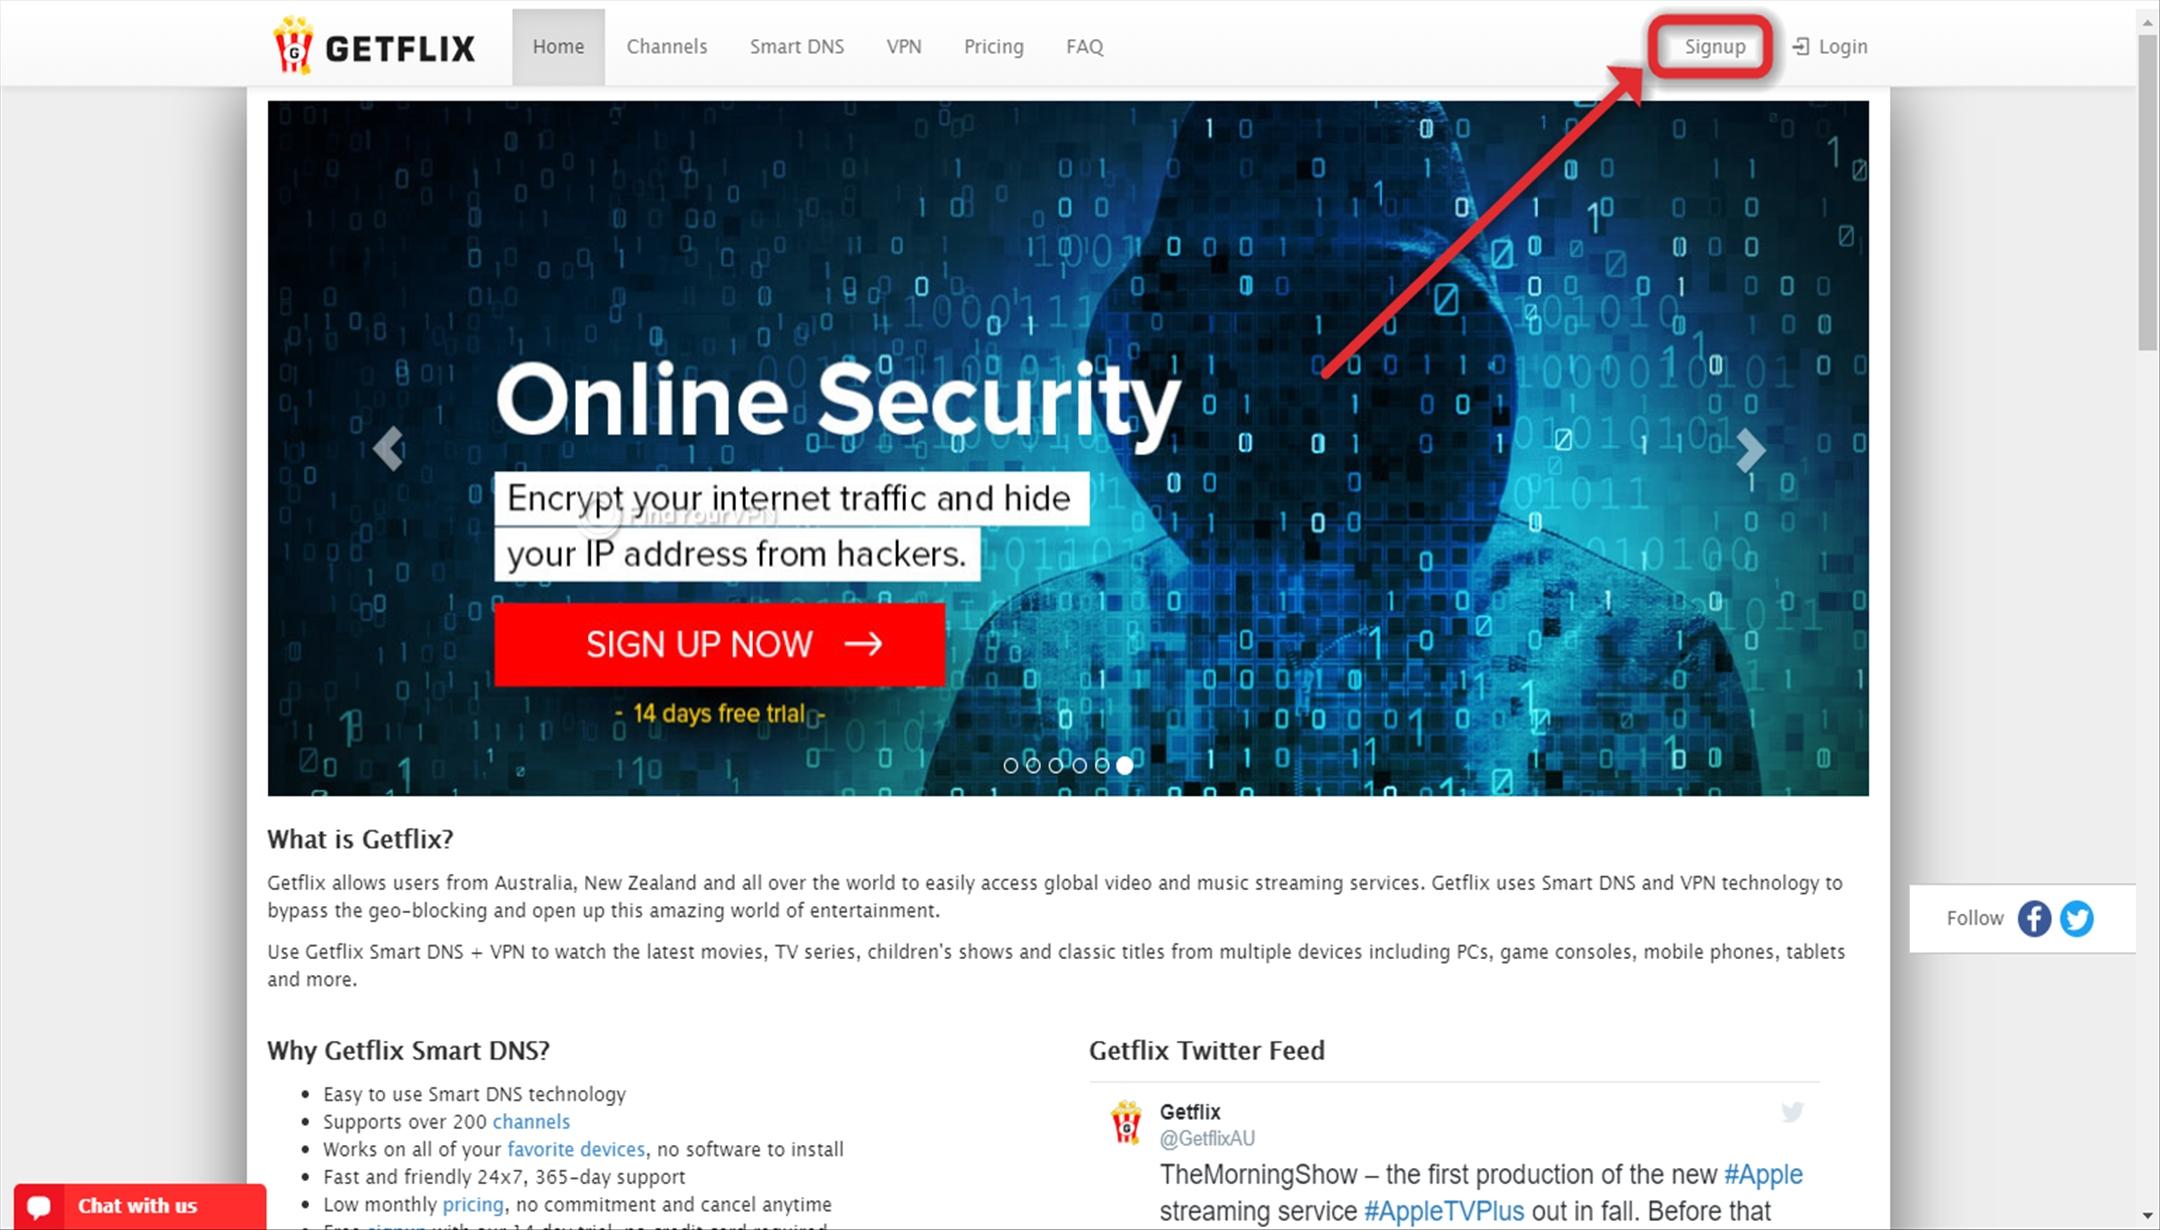 Signup button on Getflix website